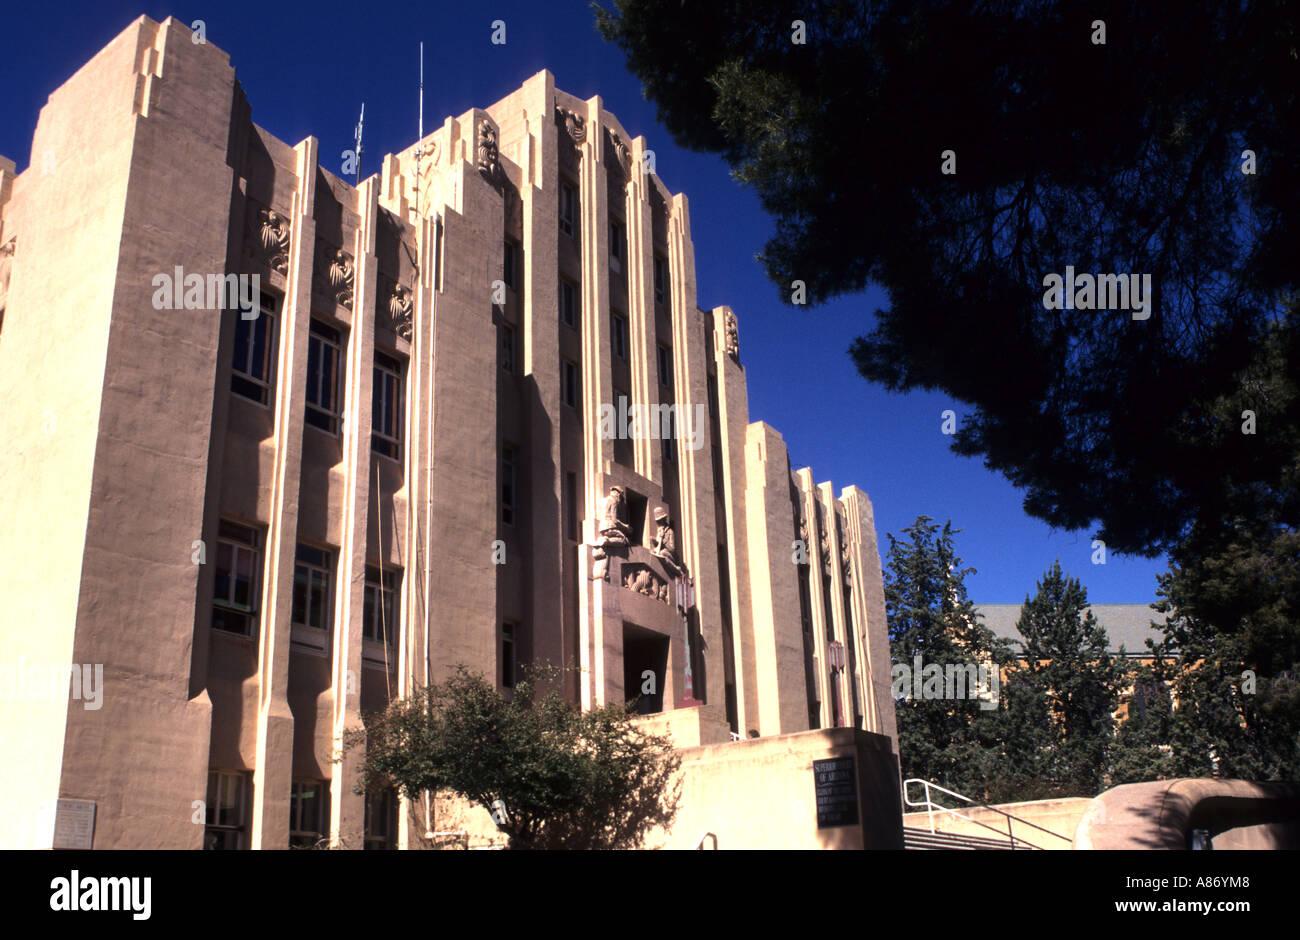 Arizona cochise county cochise - Stock Photo United States Usa Arizona Cochise County Bisbee Townhall Jugendstill